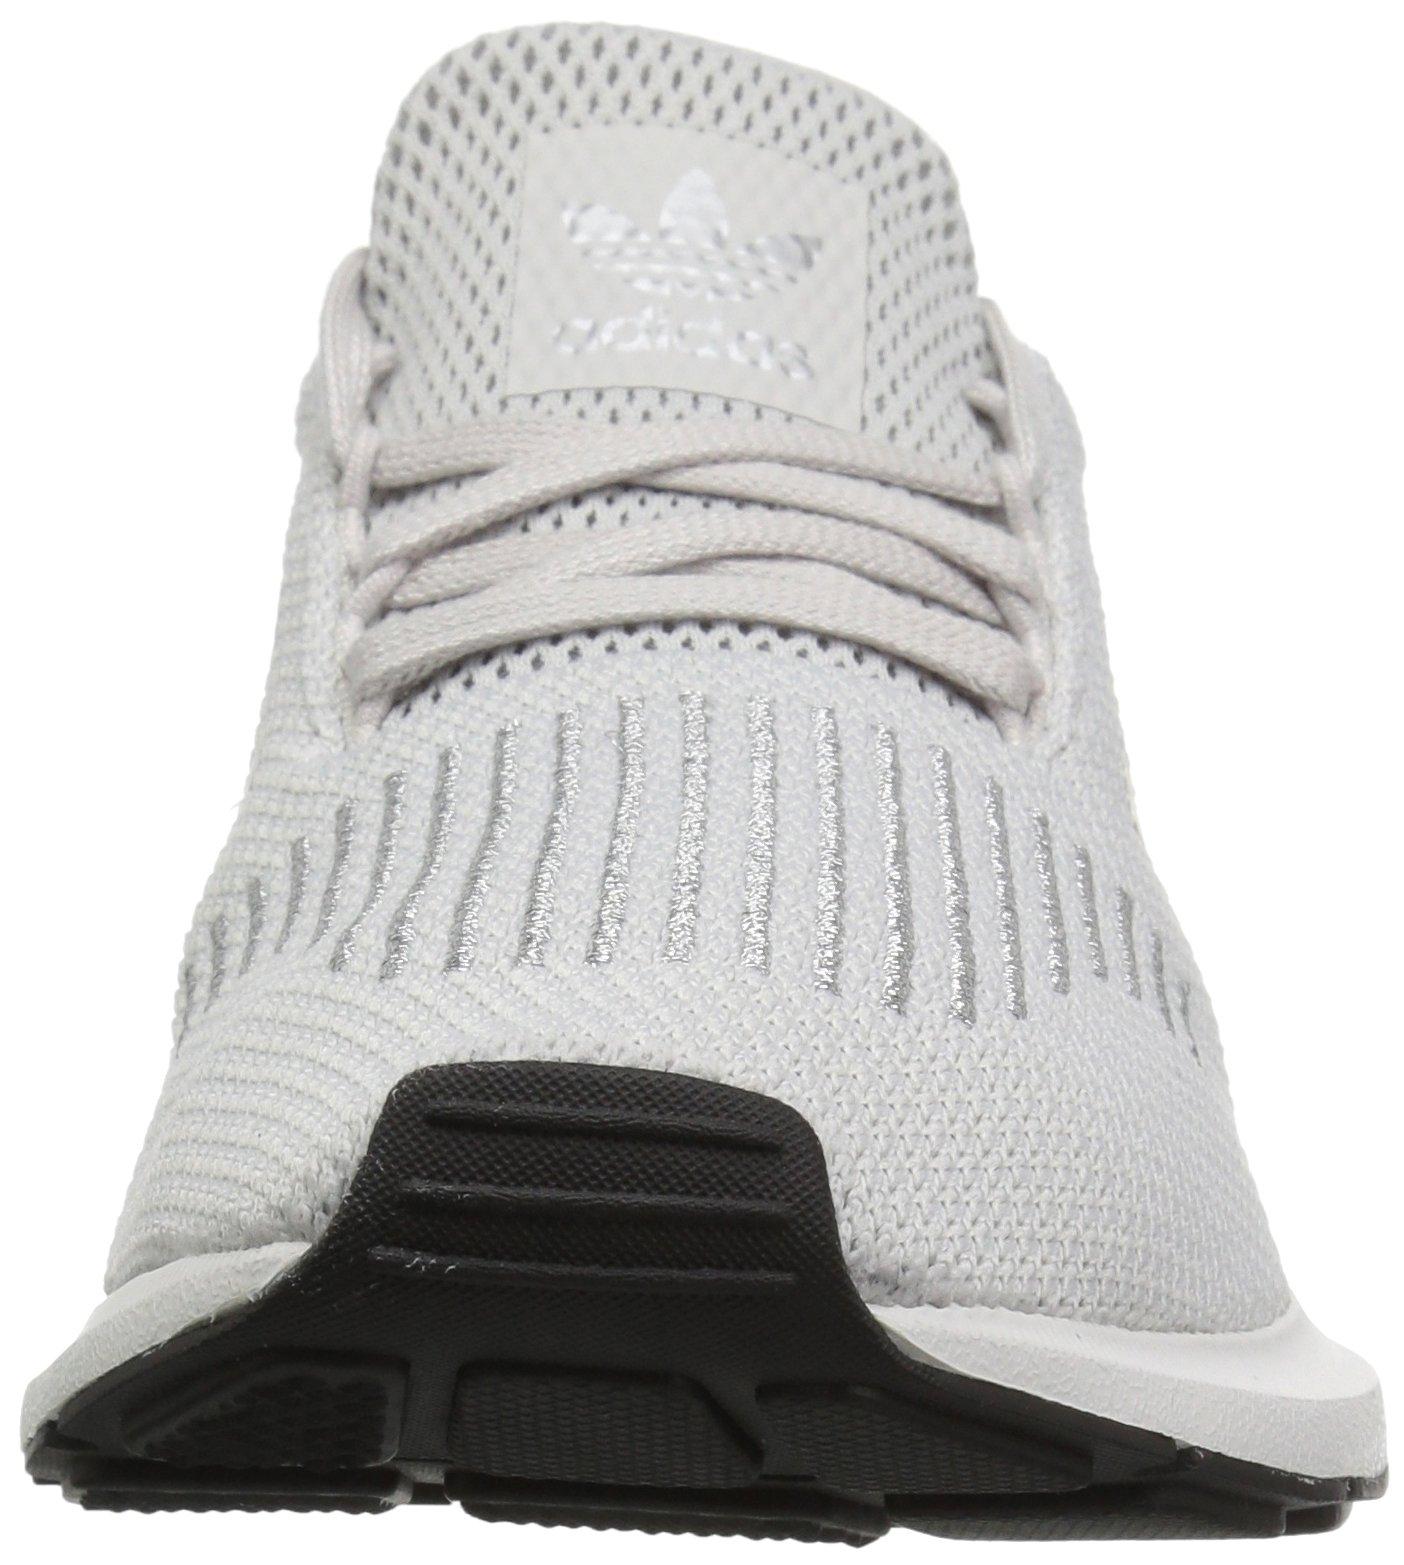 Adidas Originals  mujer 's Swift Run W, gris / plata metalizado / blanco